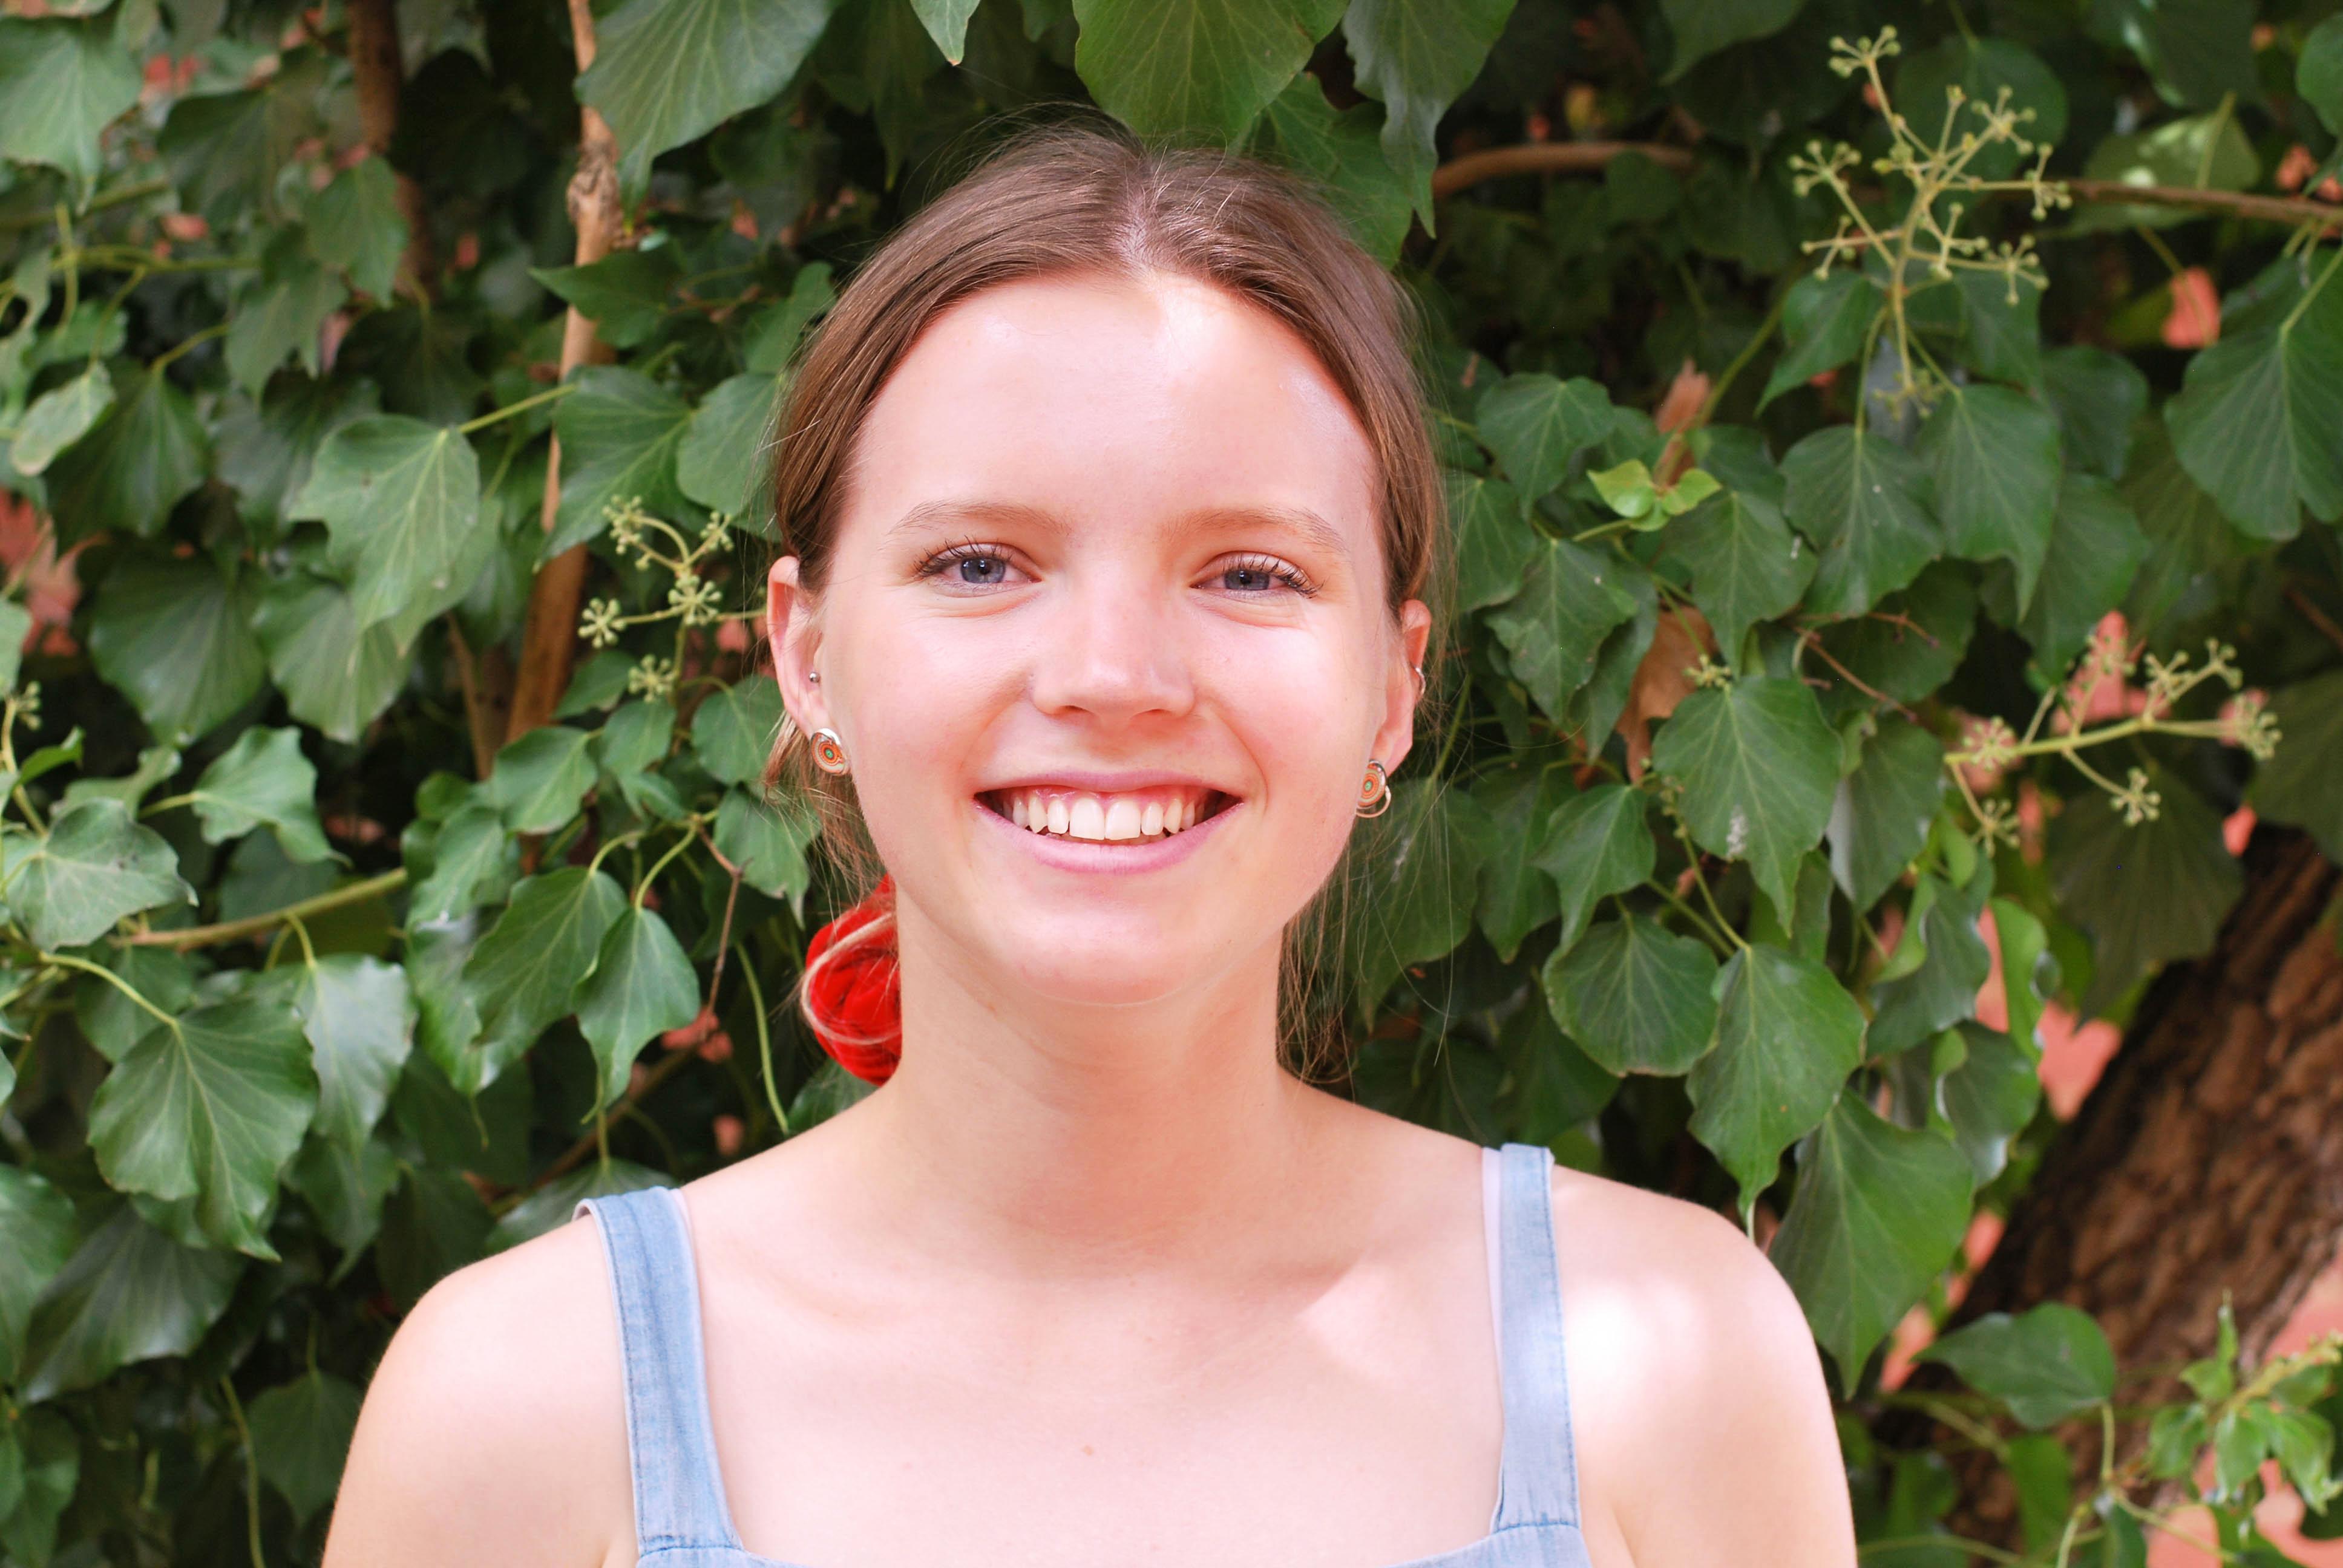 Julia Clugston smiles at the camera.